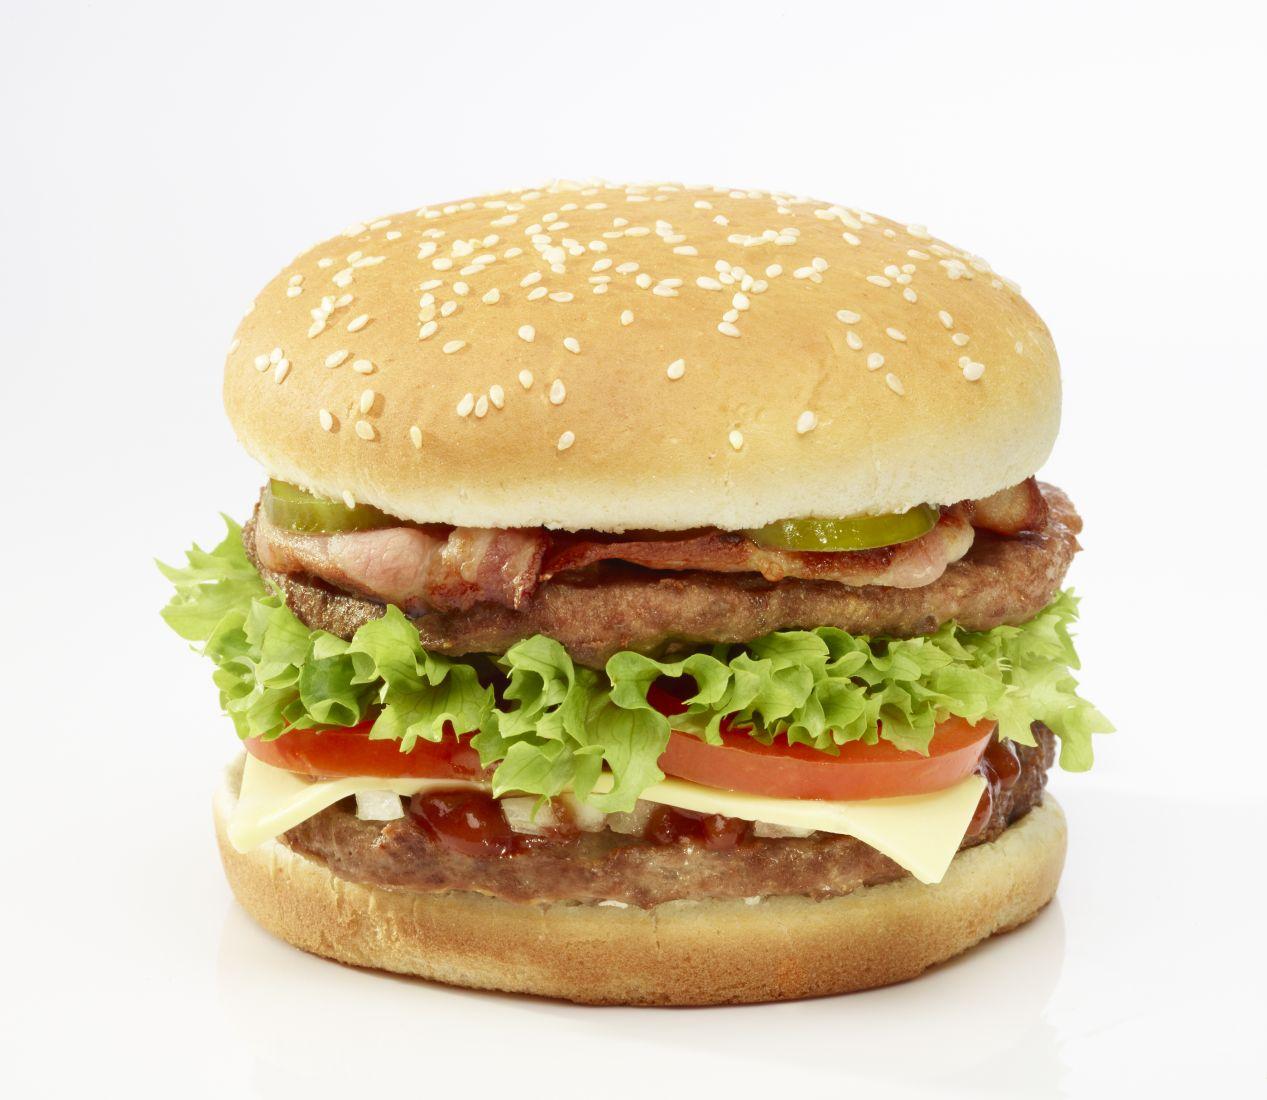 Bobbejaanland burger